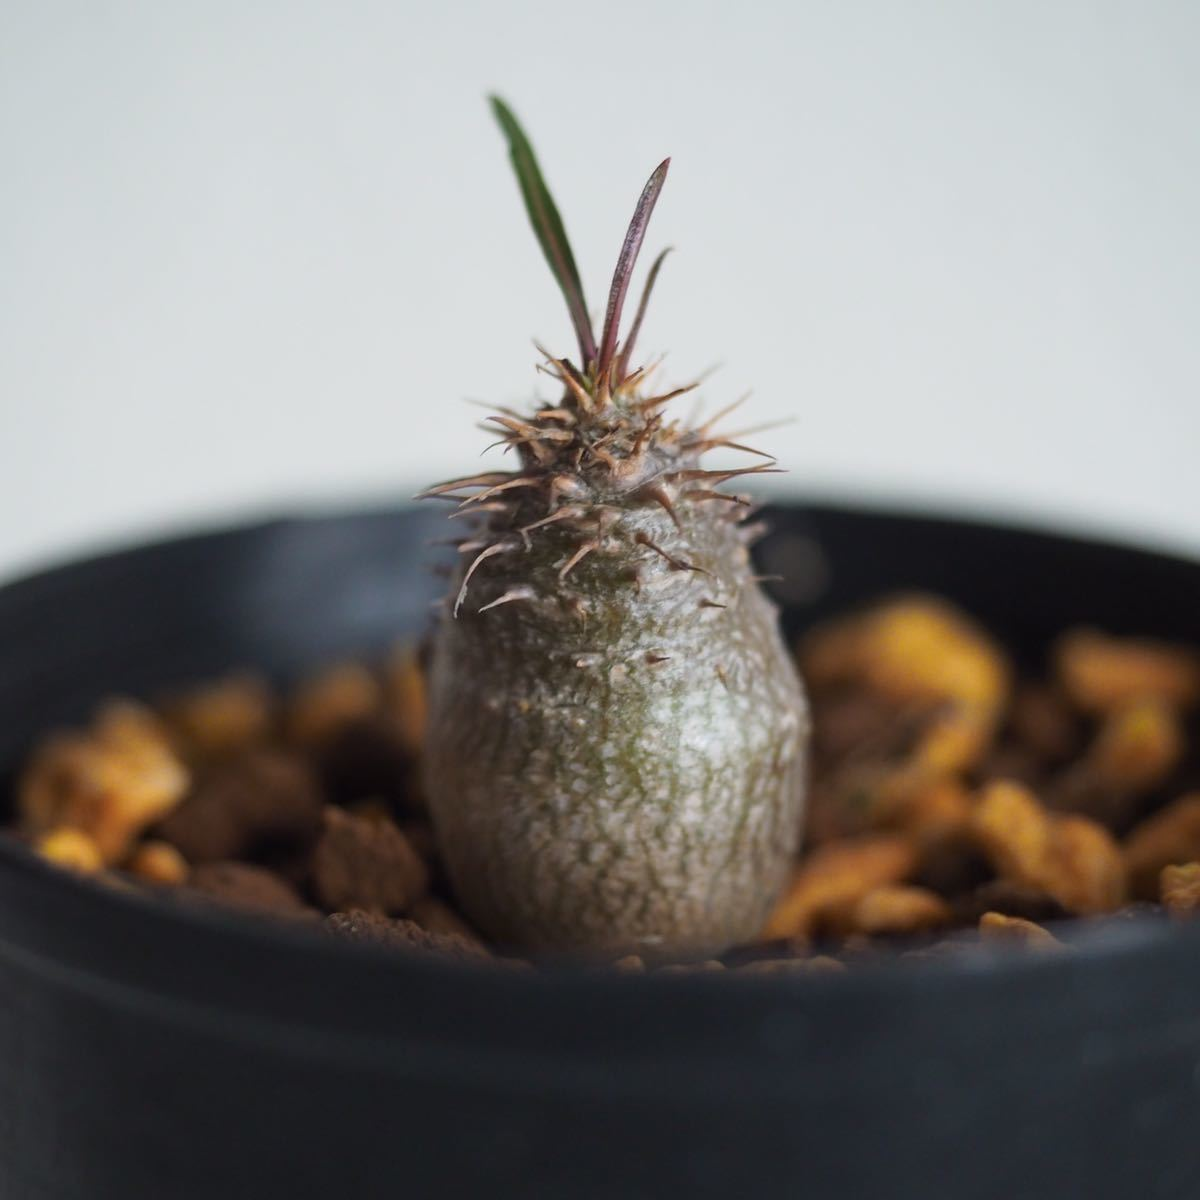 Pachypodium gracilius③【国内実生】パキポディウム グラキリス◆コーデックス 珍奇植物_画像1